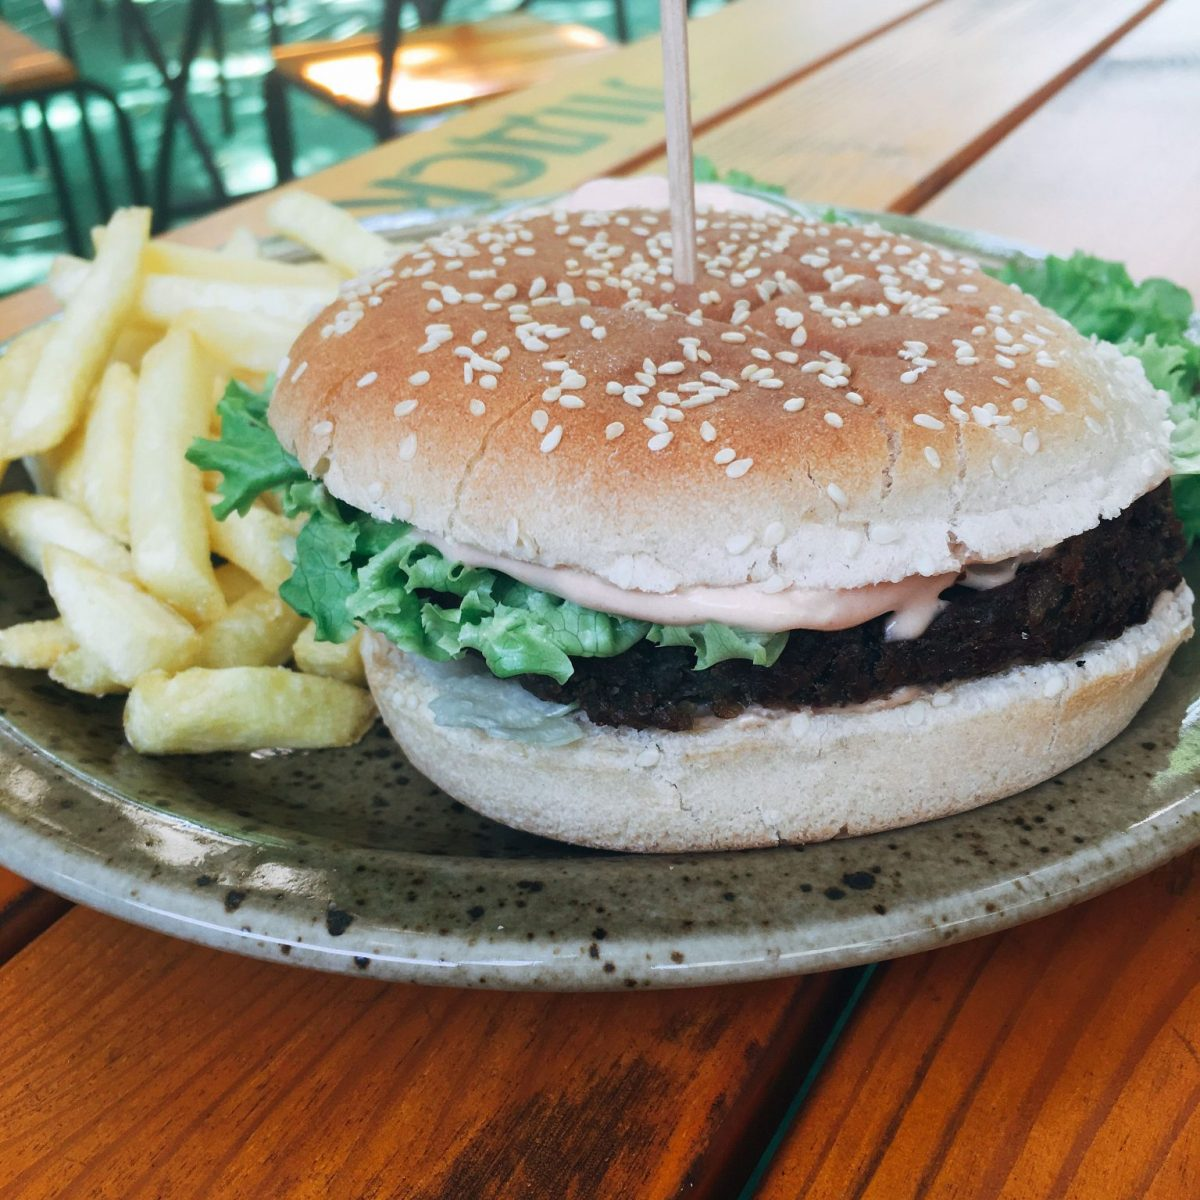 Vegan burger at Beetlejuice